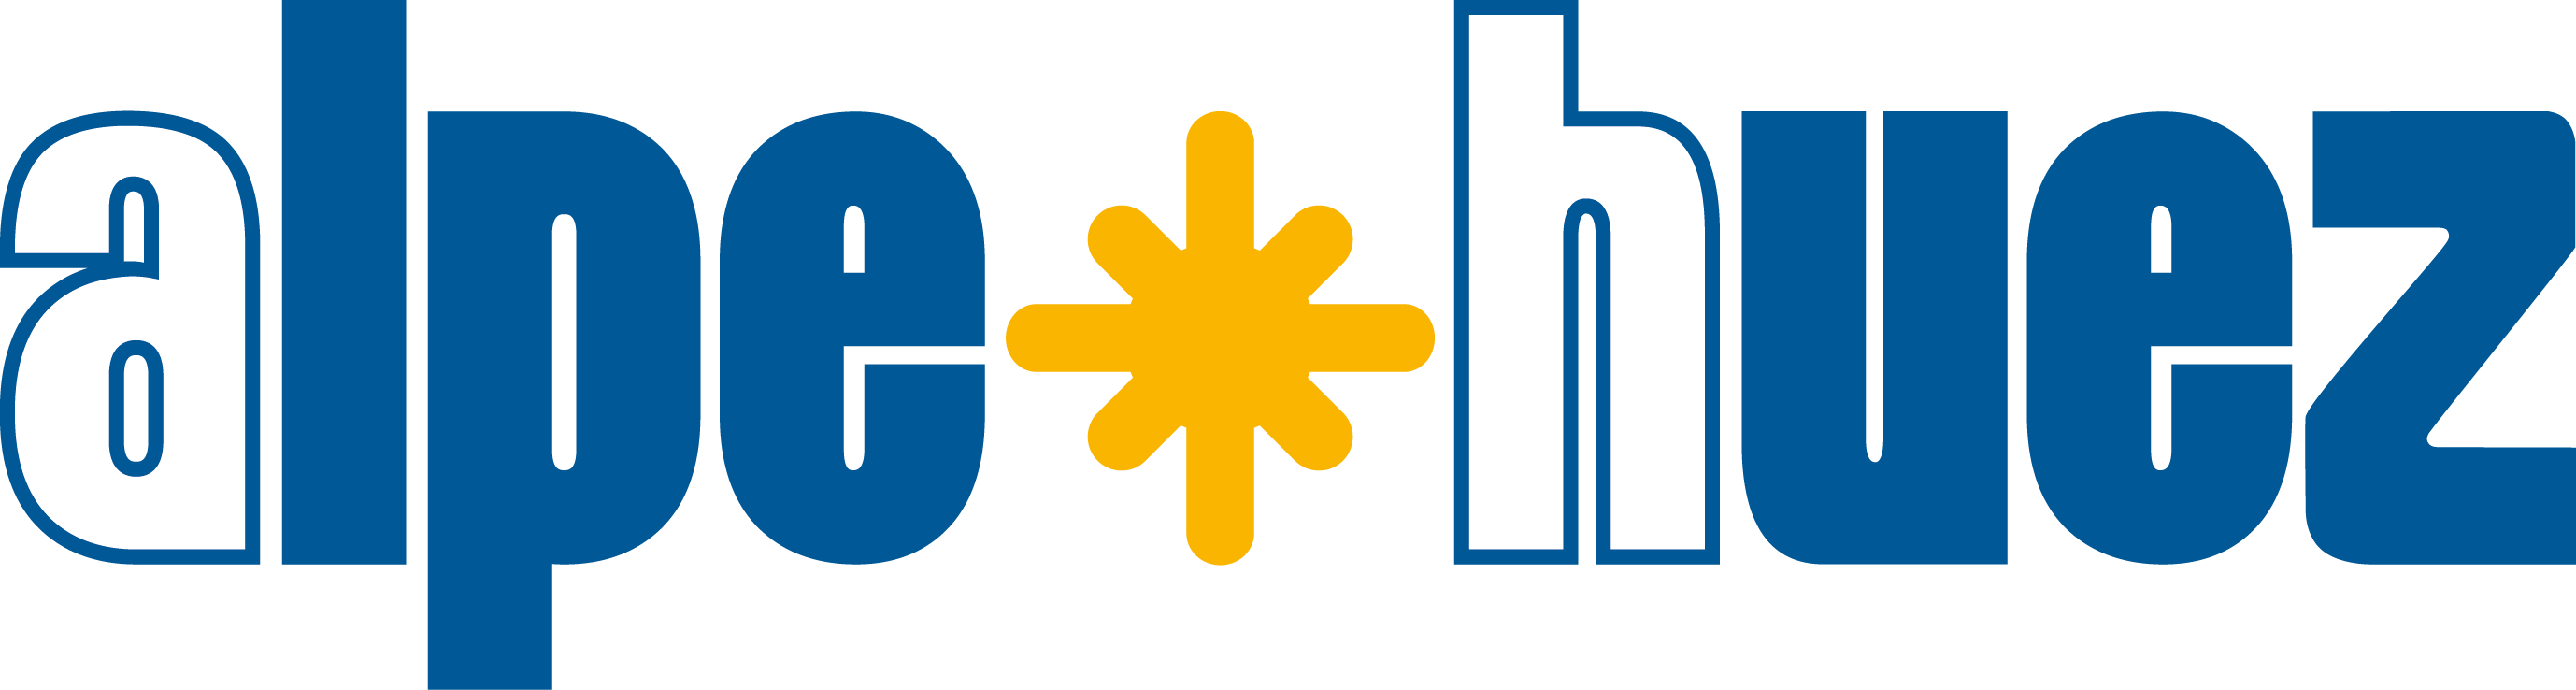 logo Alpe Huez